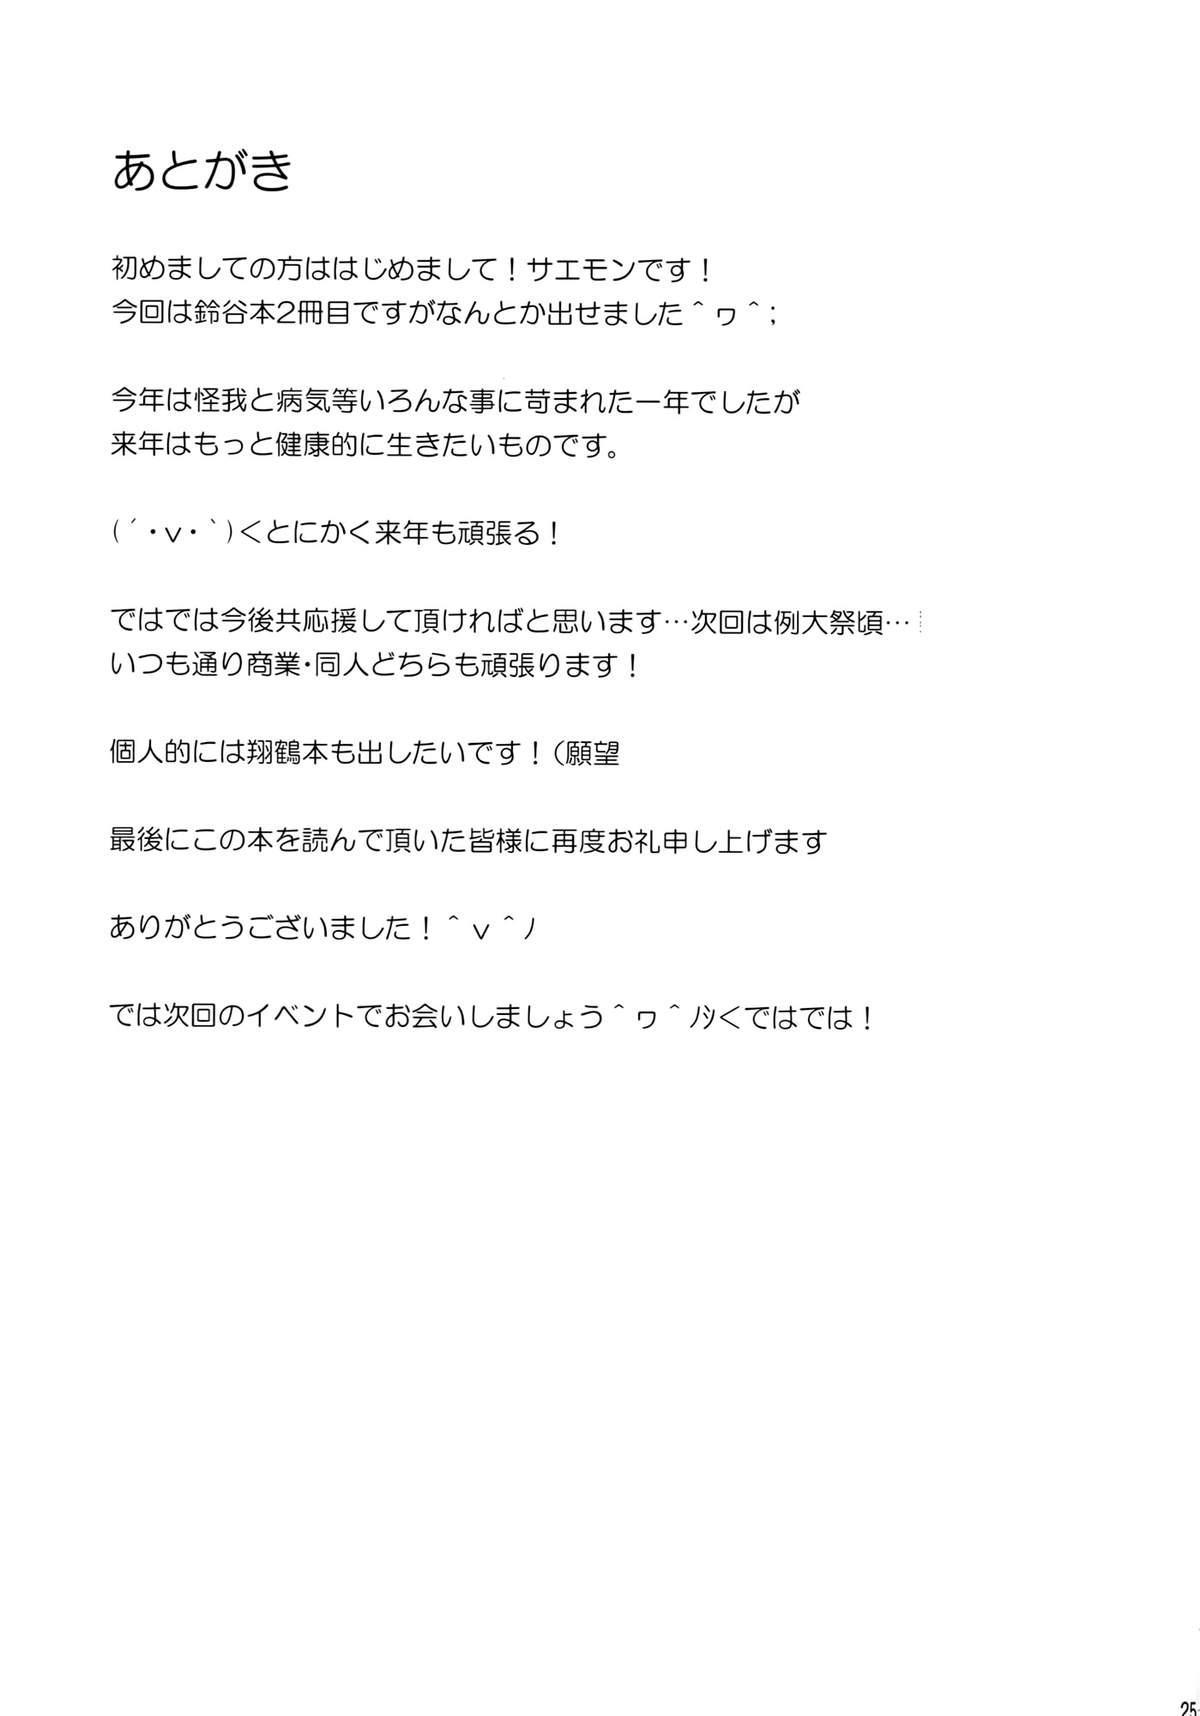 Suzuya to Motto!! Ichaicha shitai!! | I want to Flirt With Suzuya More!! 23